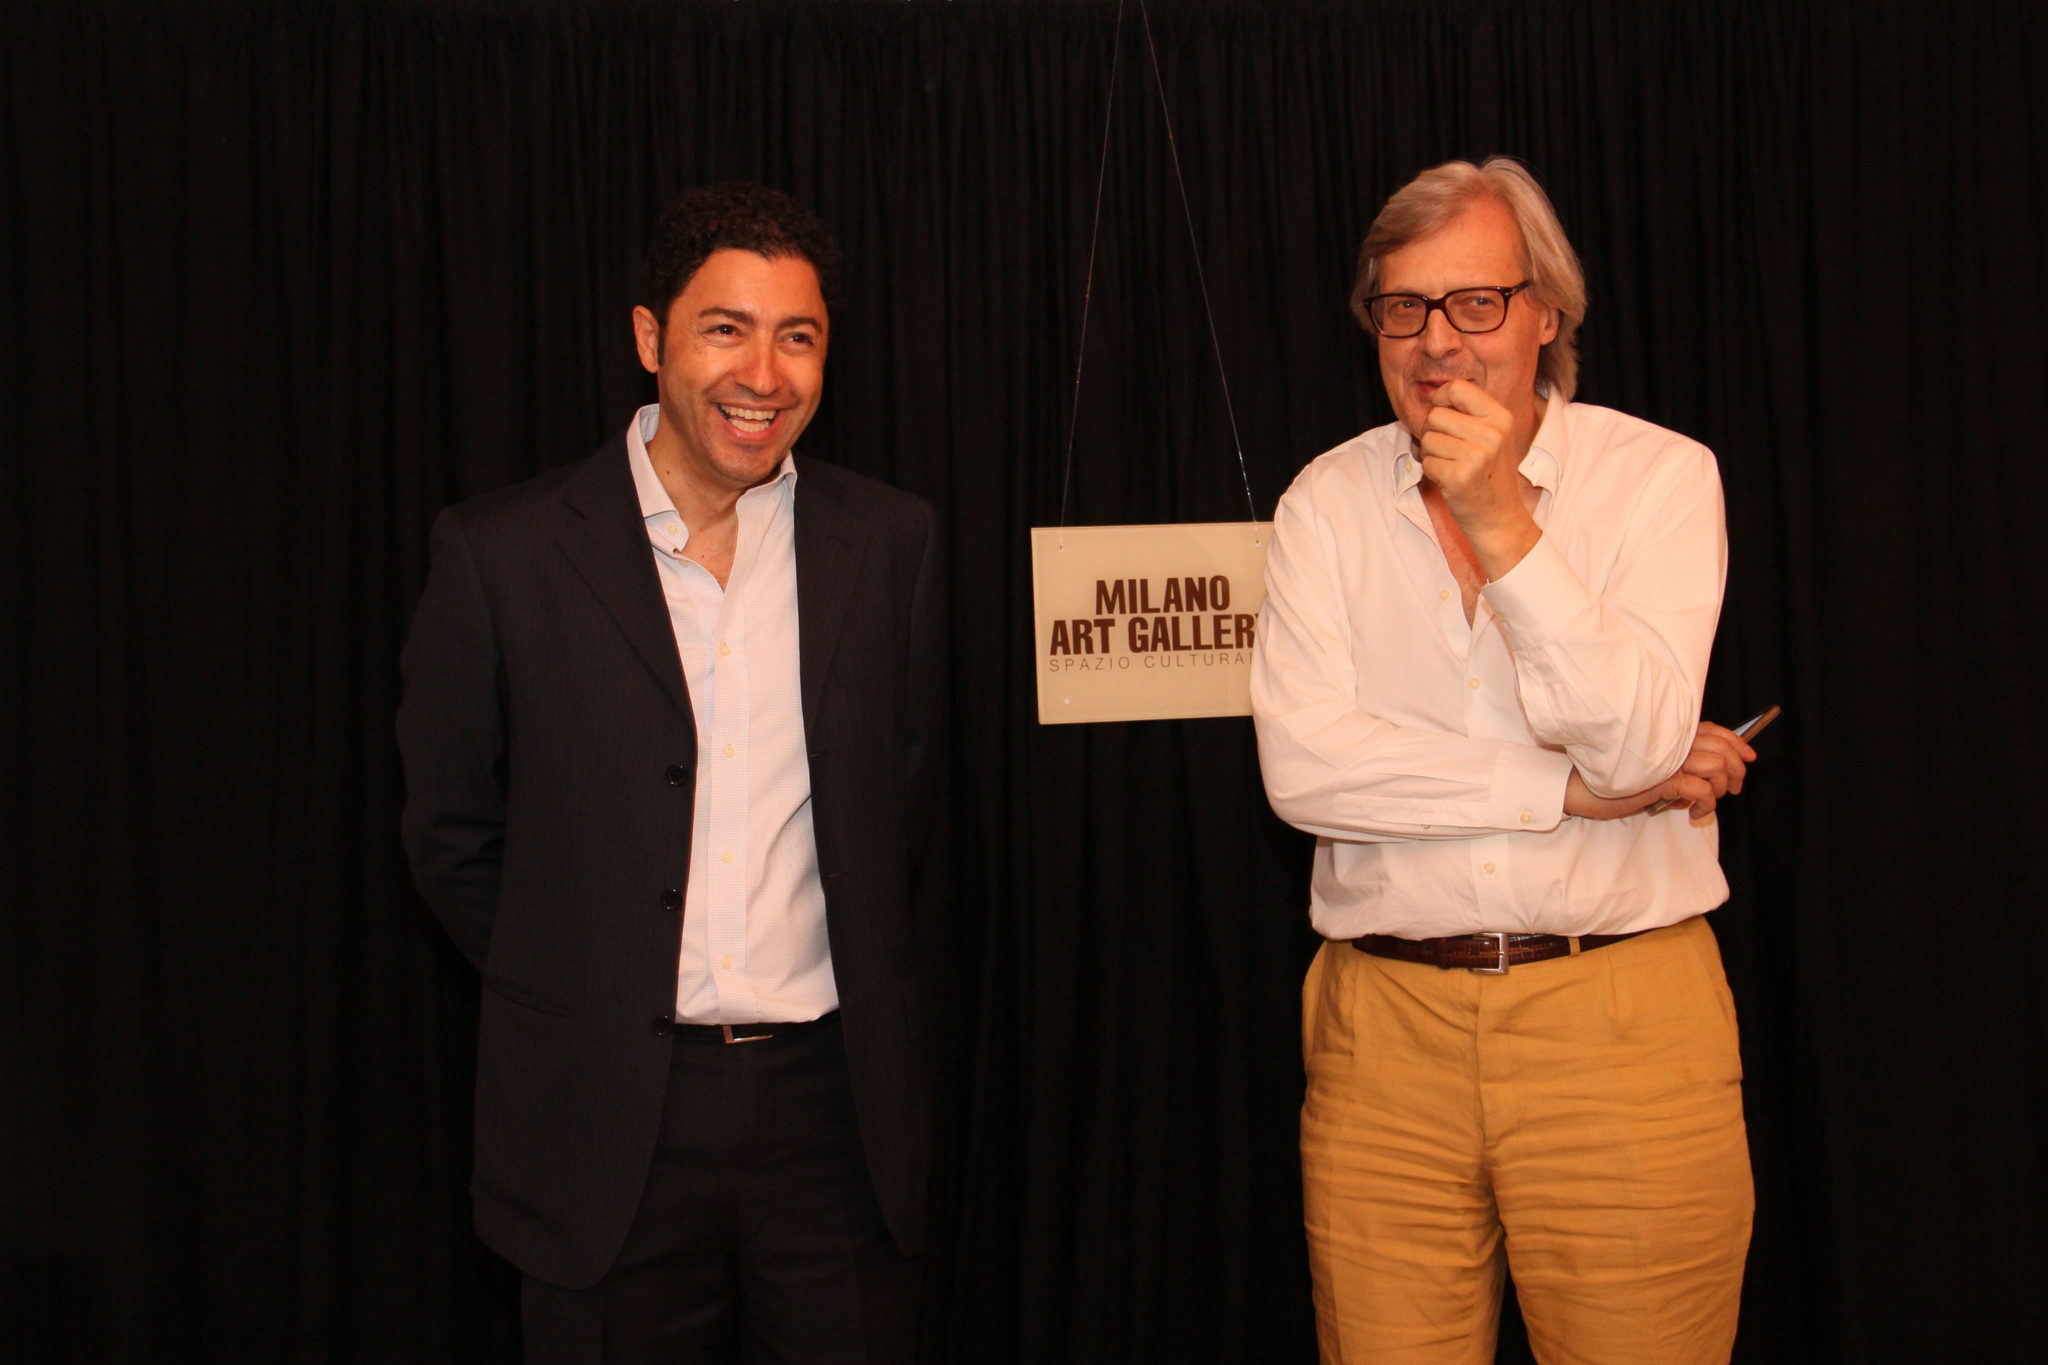 Partita con successo la Biennale Milano